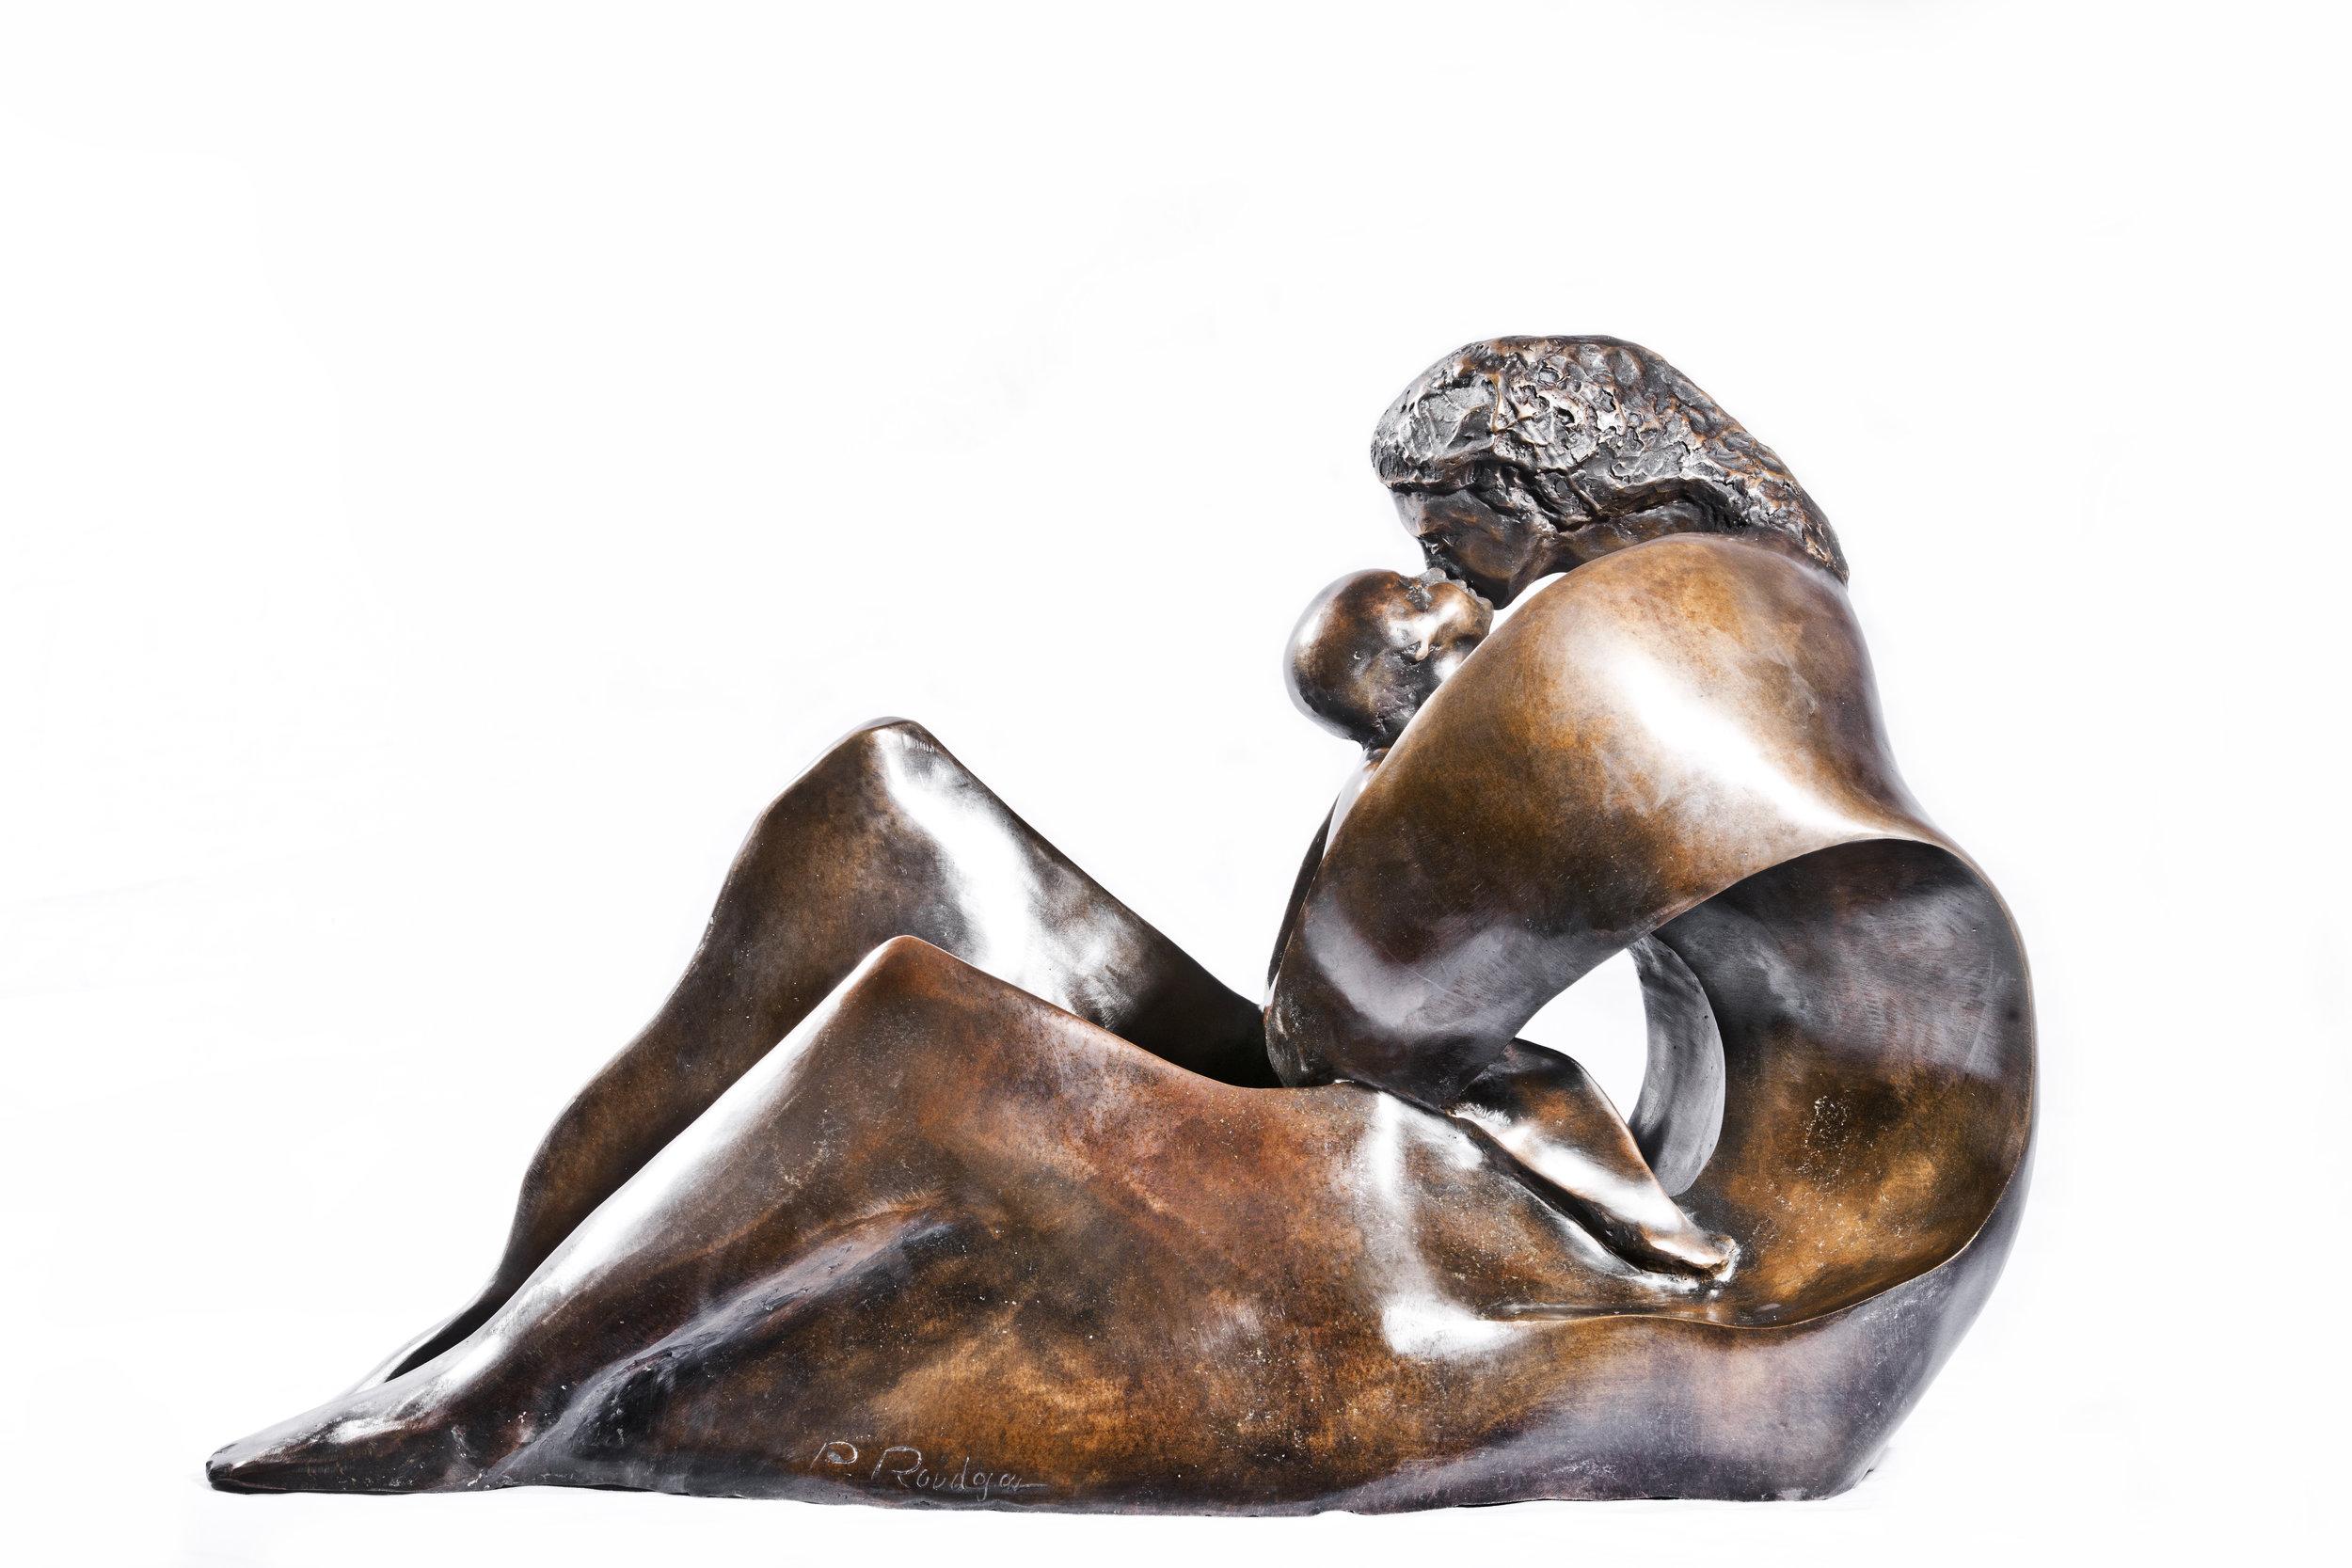 Maternity 54.77.34 cm bronze